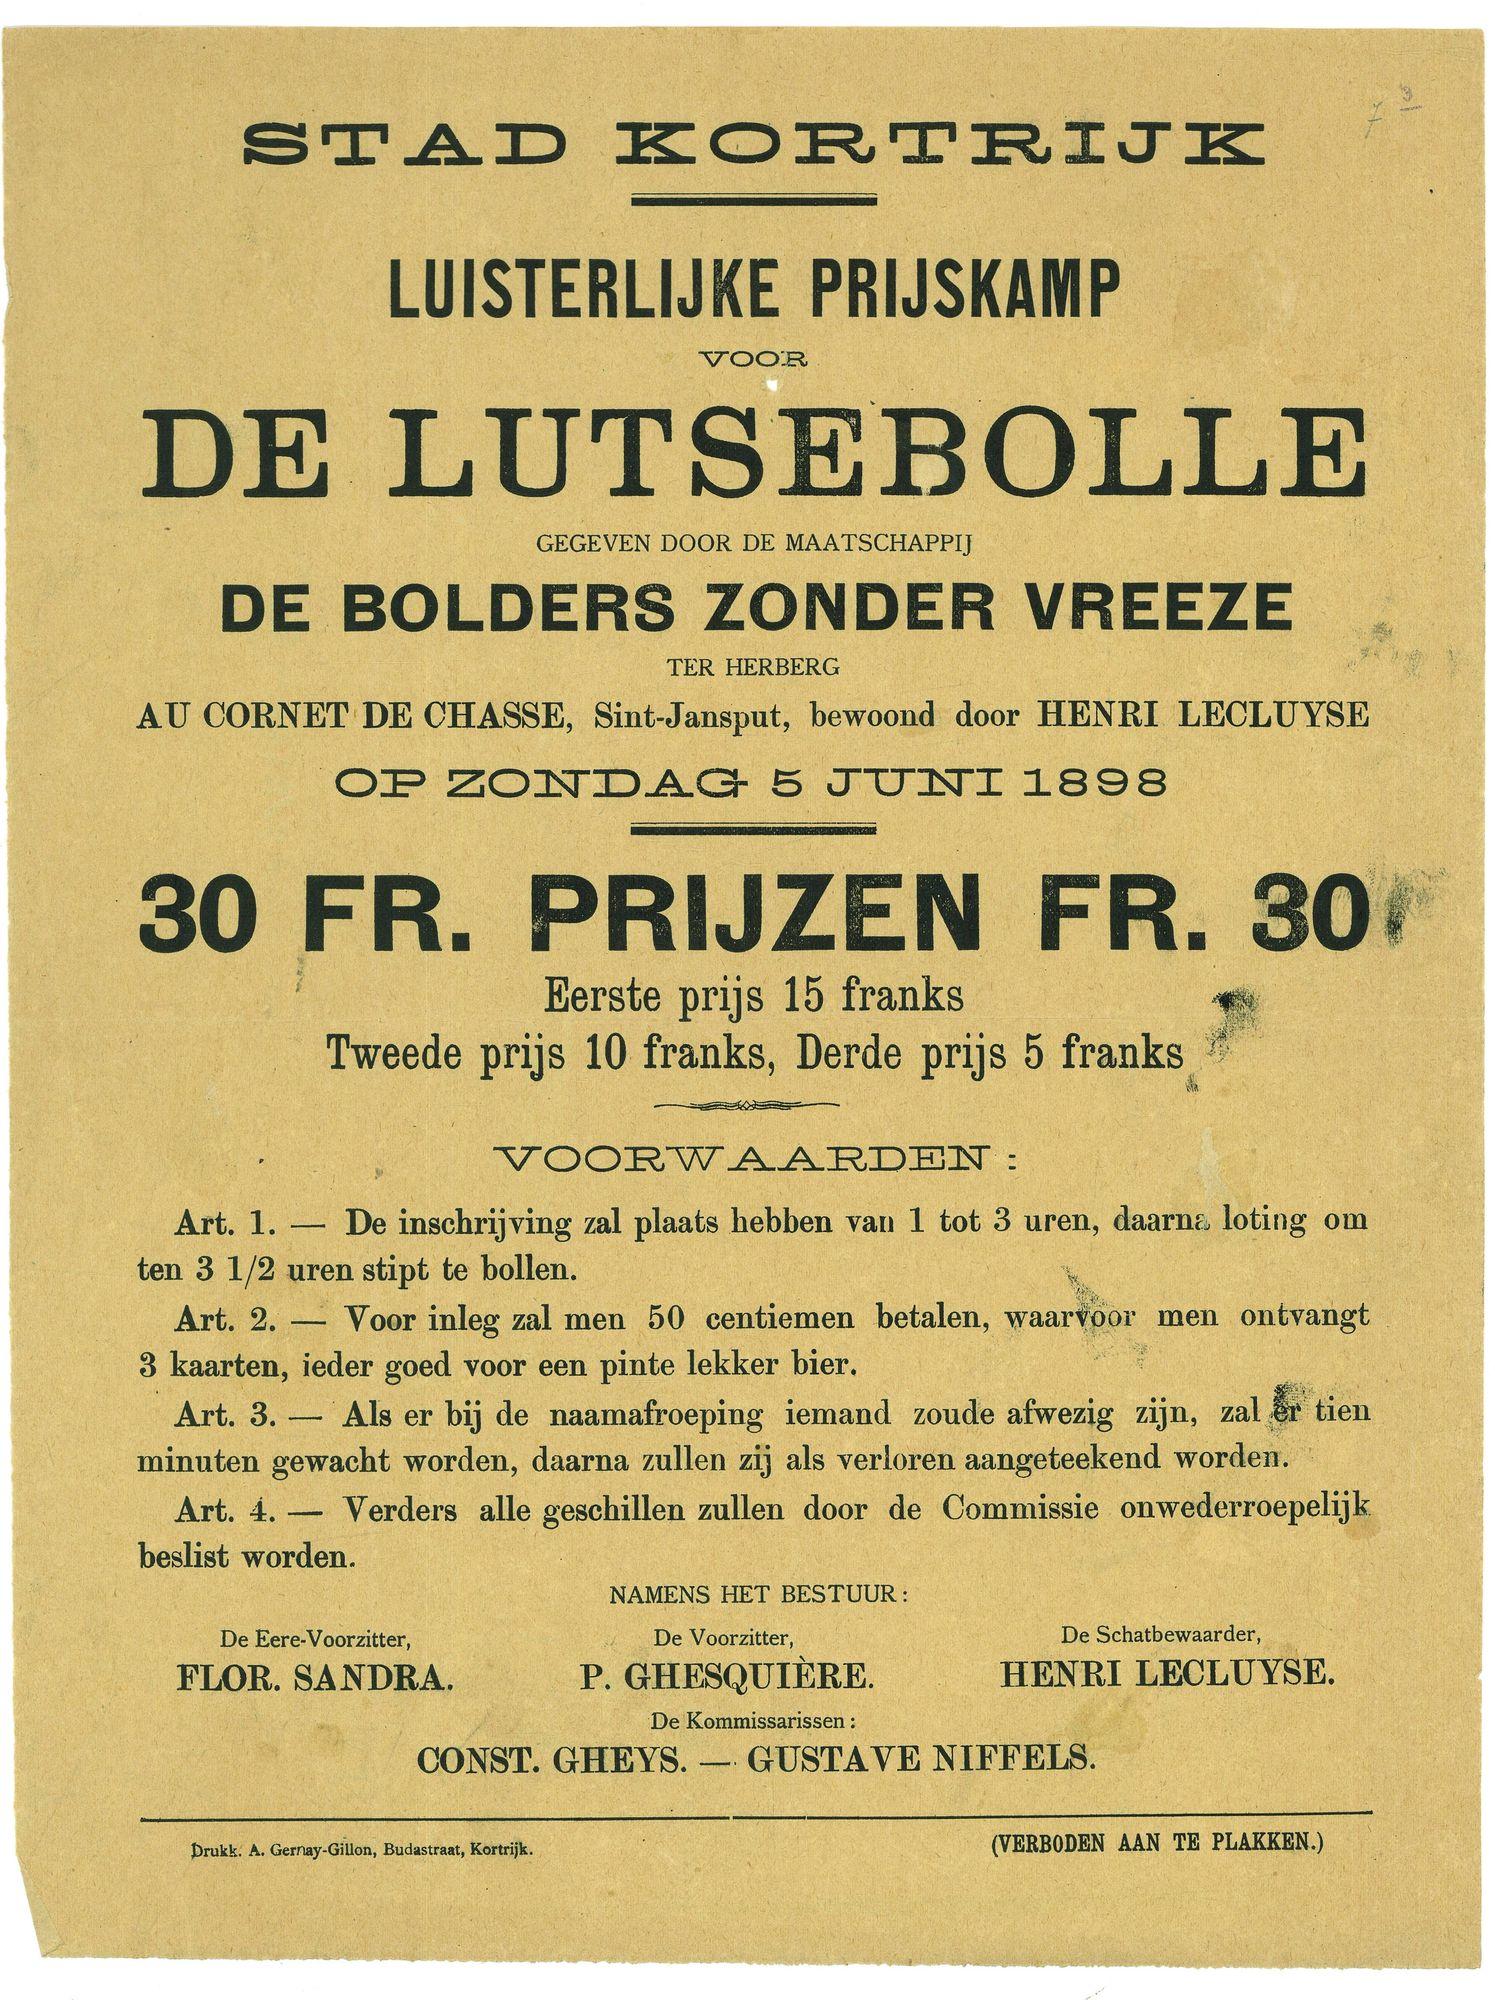 Prijskamp lutsebolle in 1898